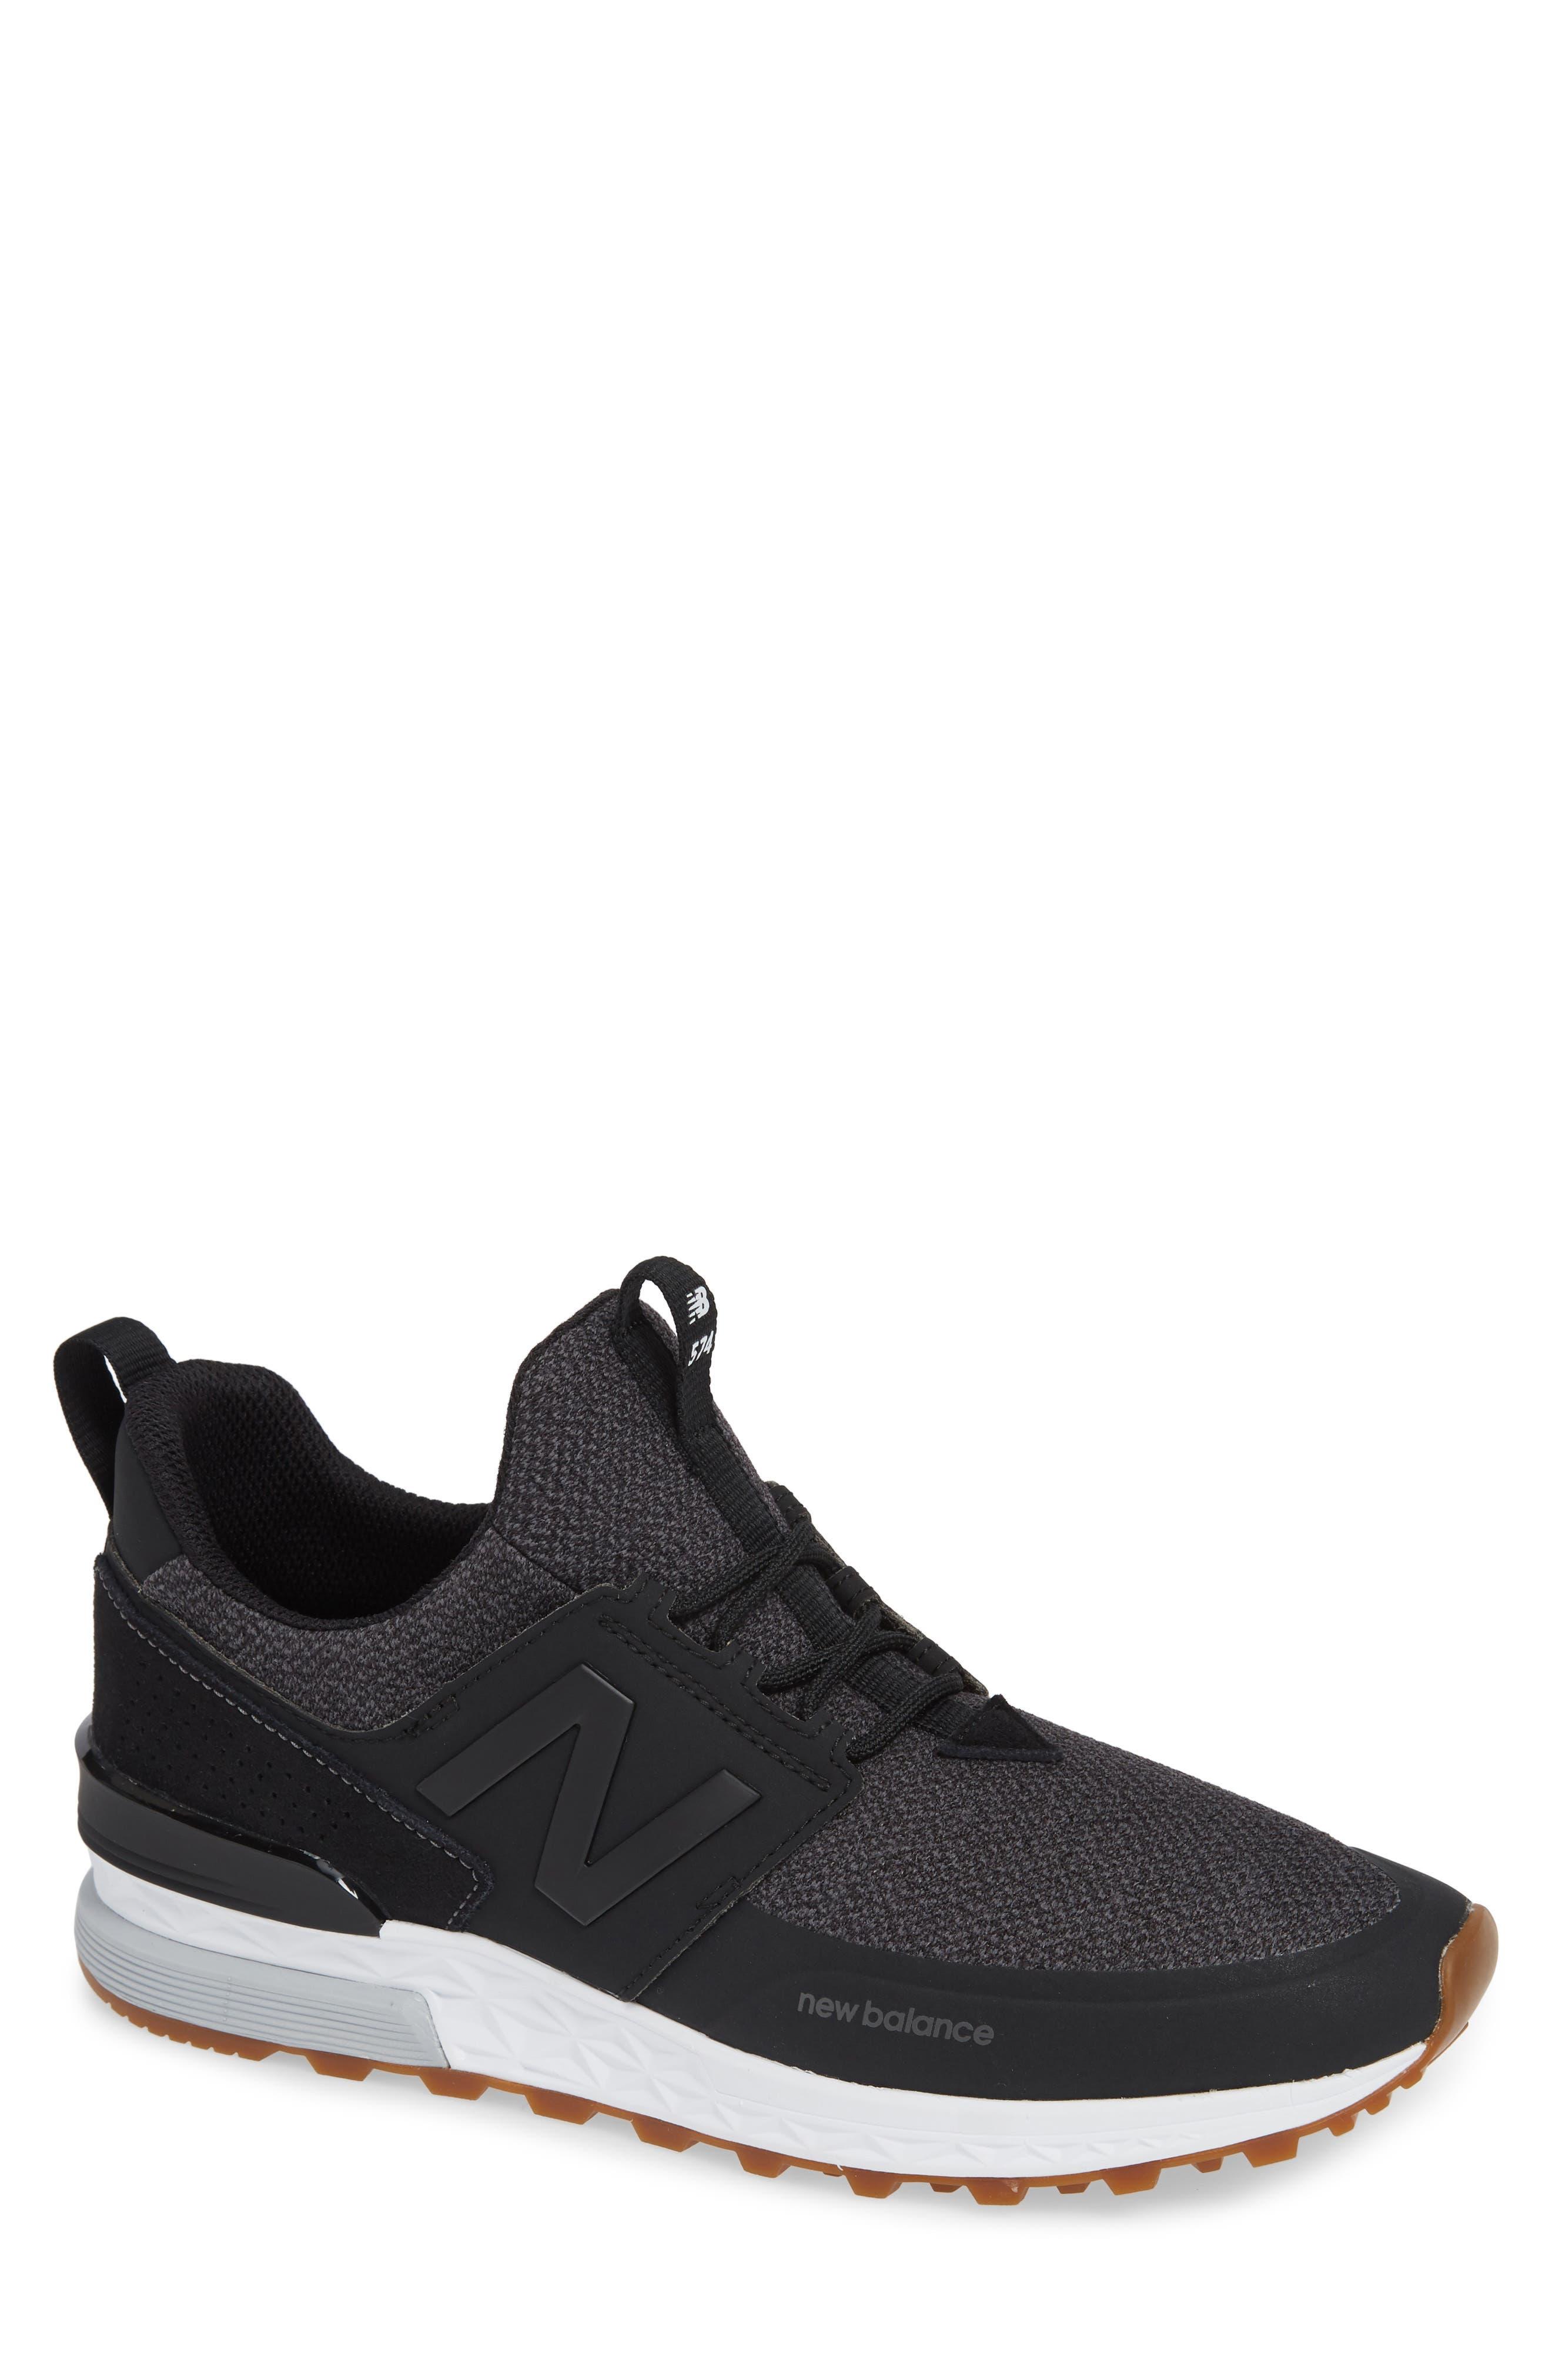 574 Sport Sneaker,                         Main,                         color, BLACK SYNTHETIC/ TEXTILE